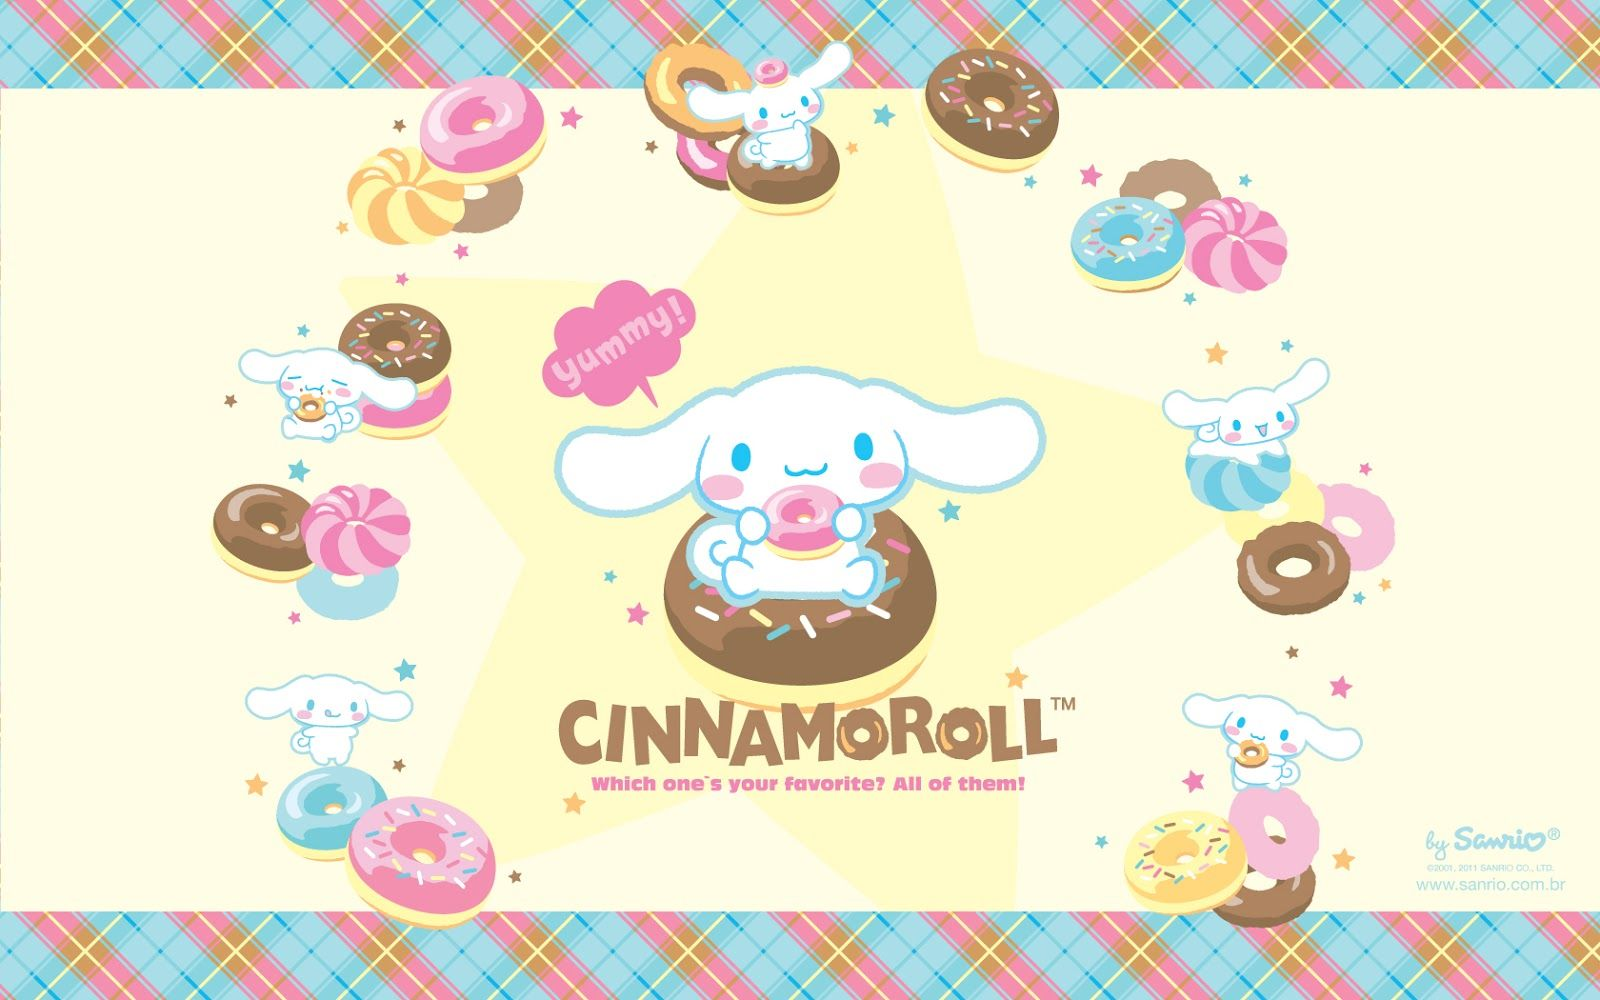 Cinnamoroll Wallpapers Top Free Cinnamoroll Backgrounds Wallpaperaccess